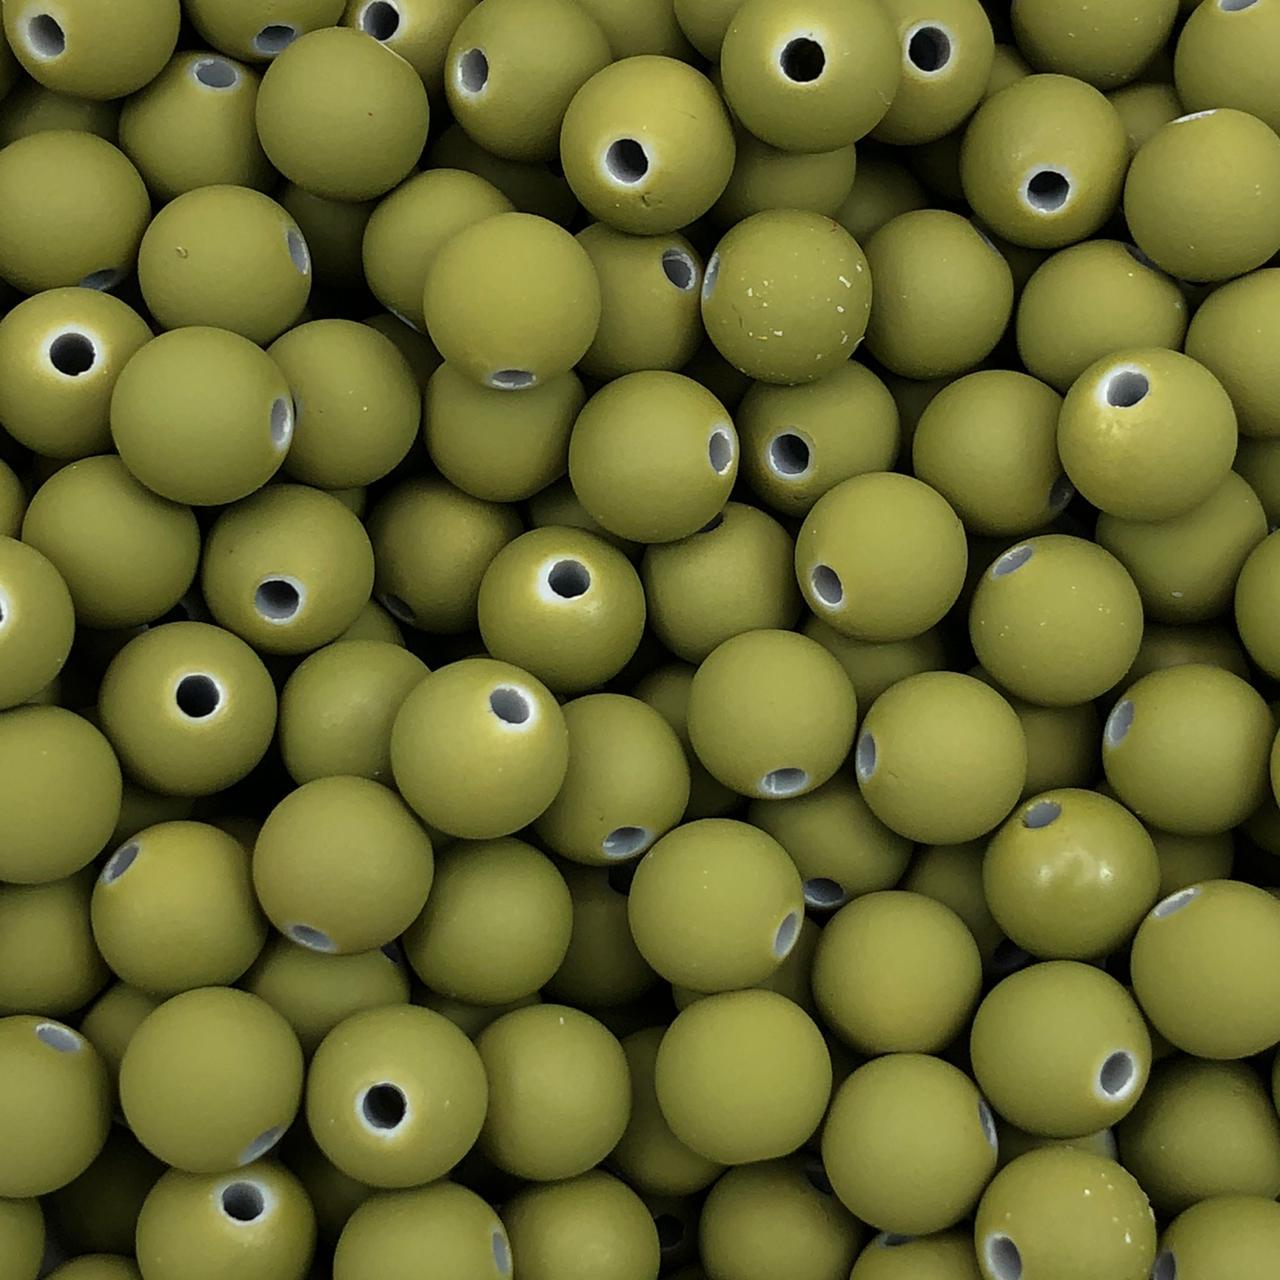 BOL263 - Bola Emborrachada Verde Militar 8mm - 20Grs